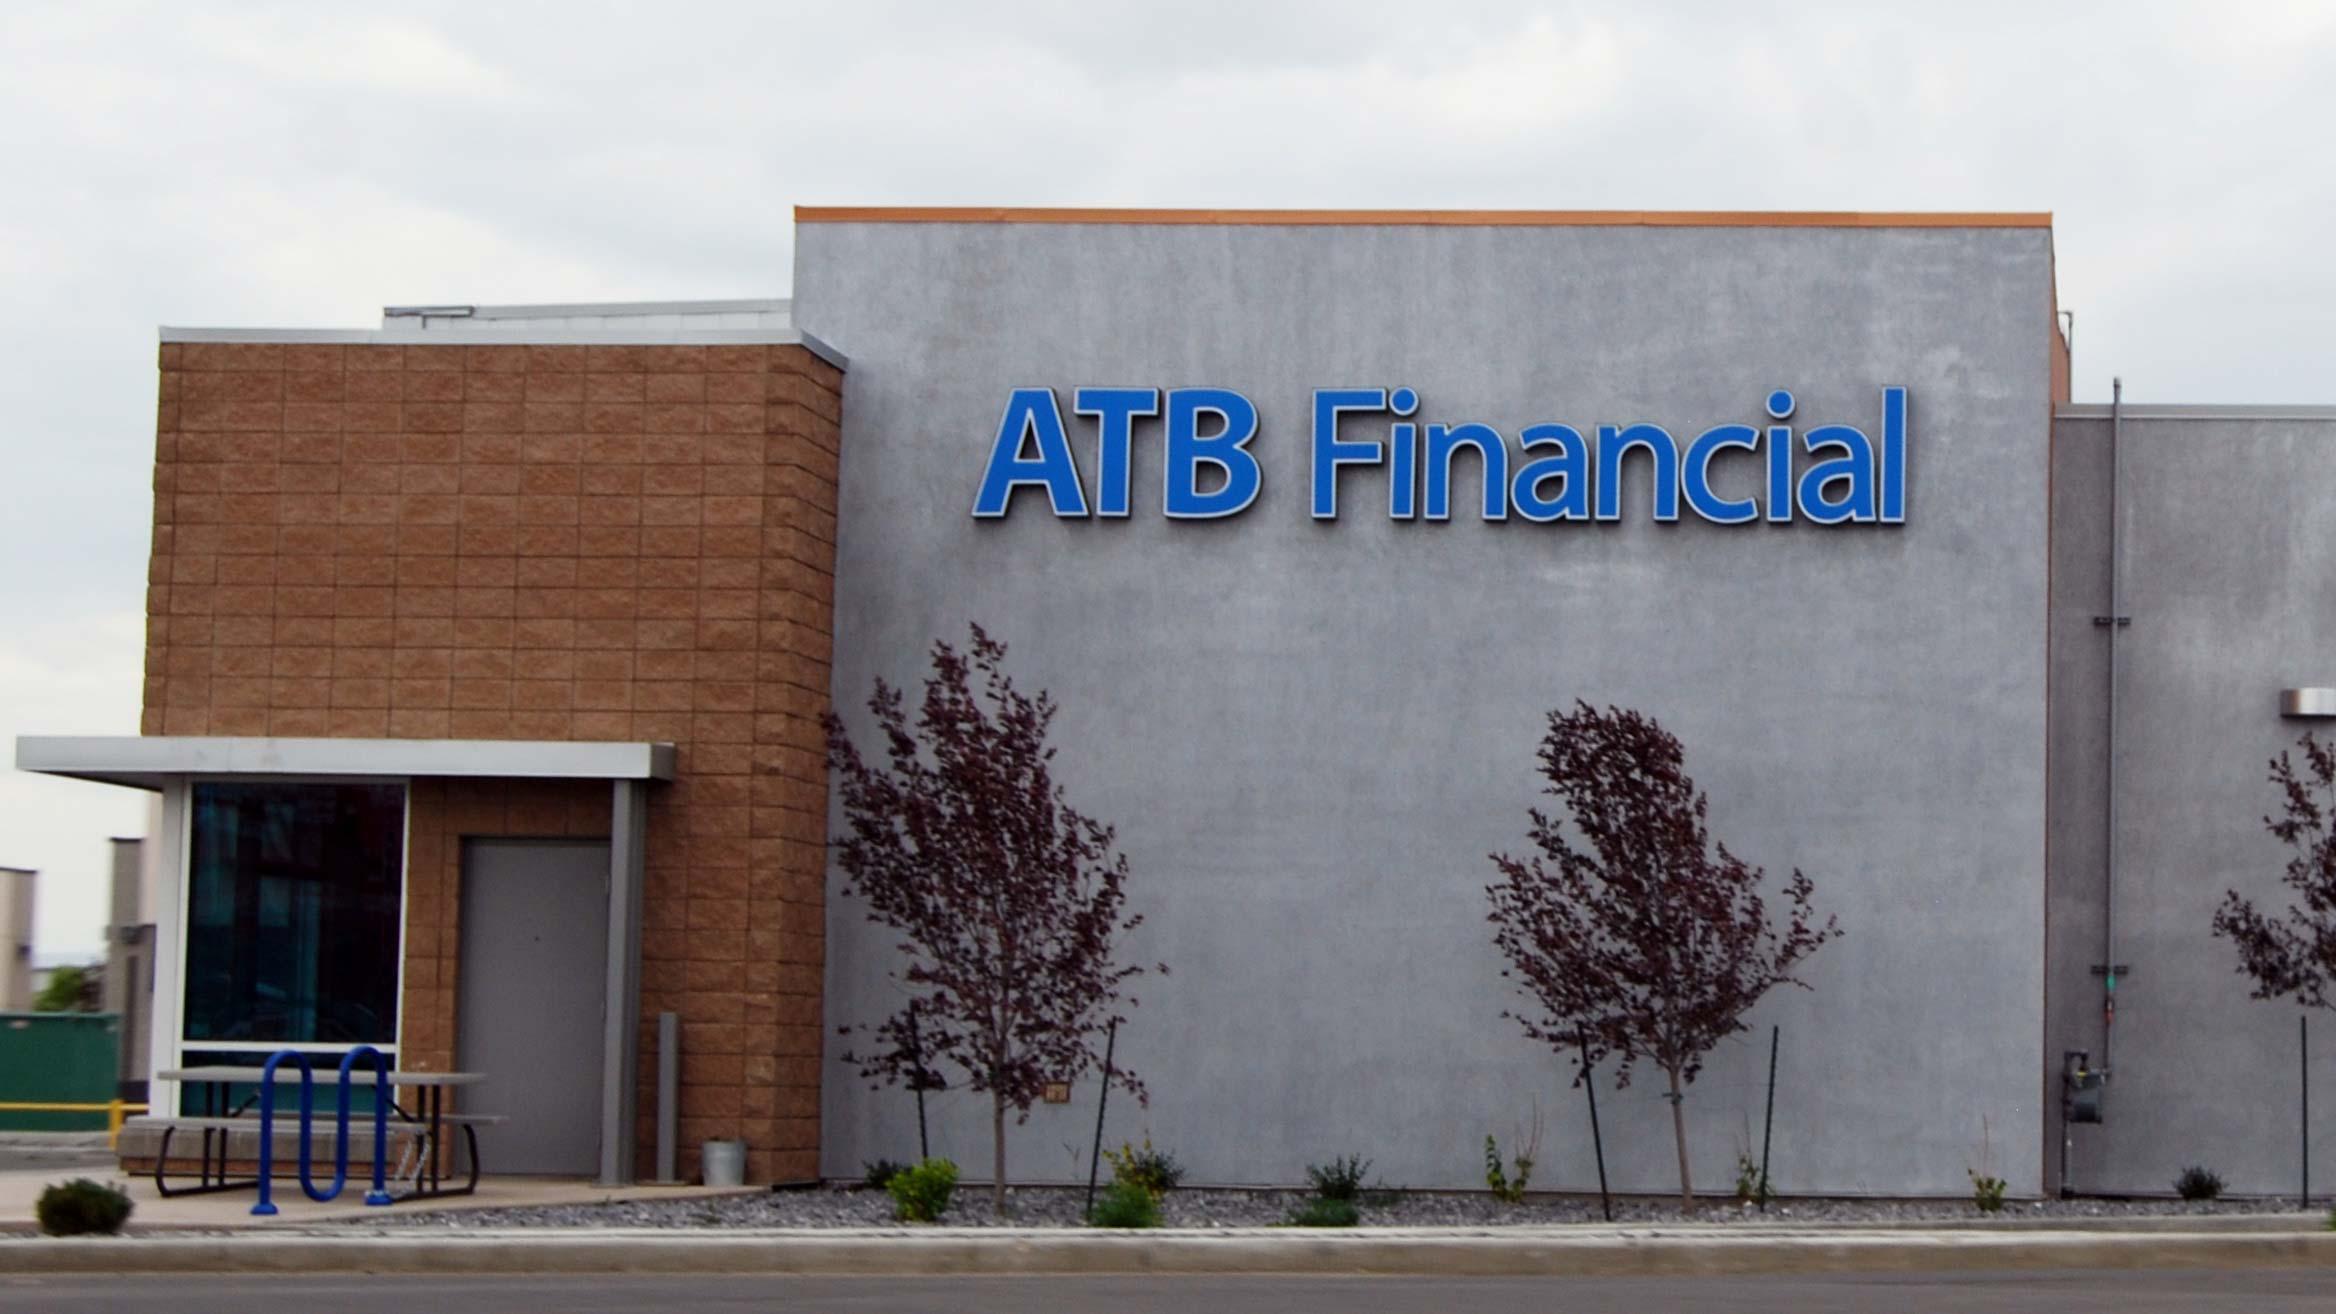 atb financial building - atb apple pay